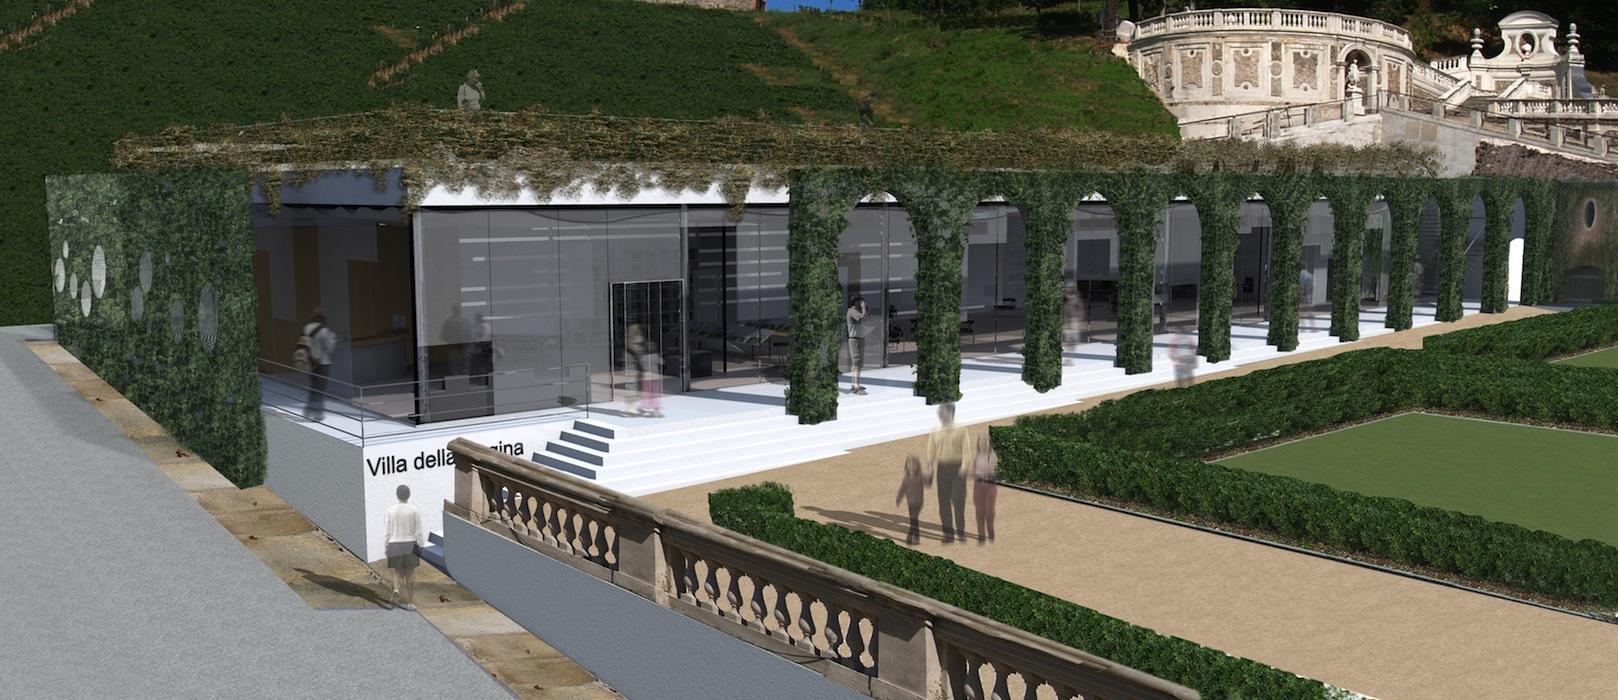 Villa_della_regina_concorso